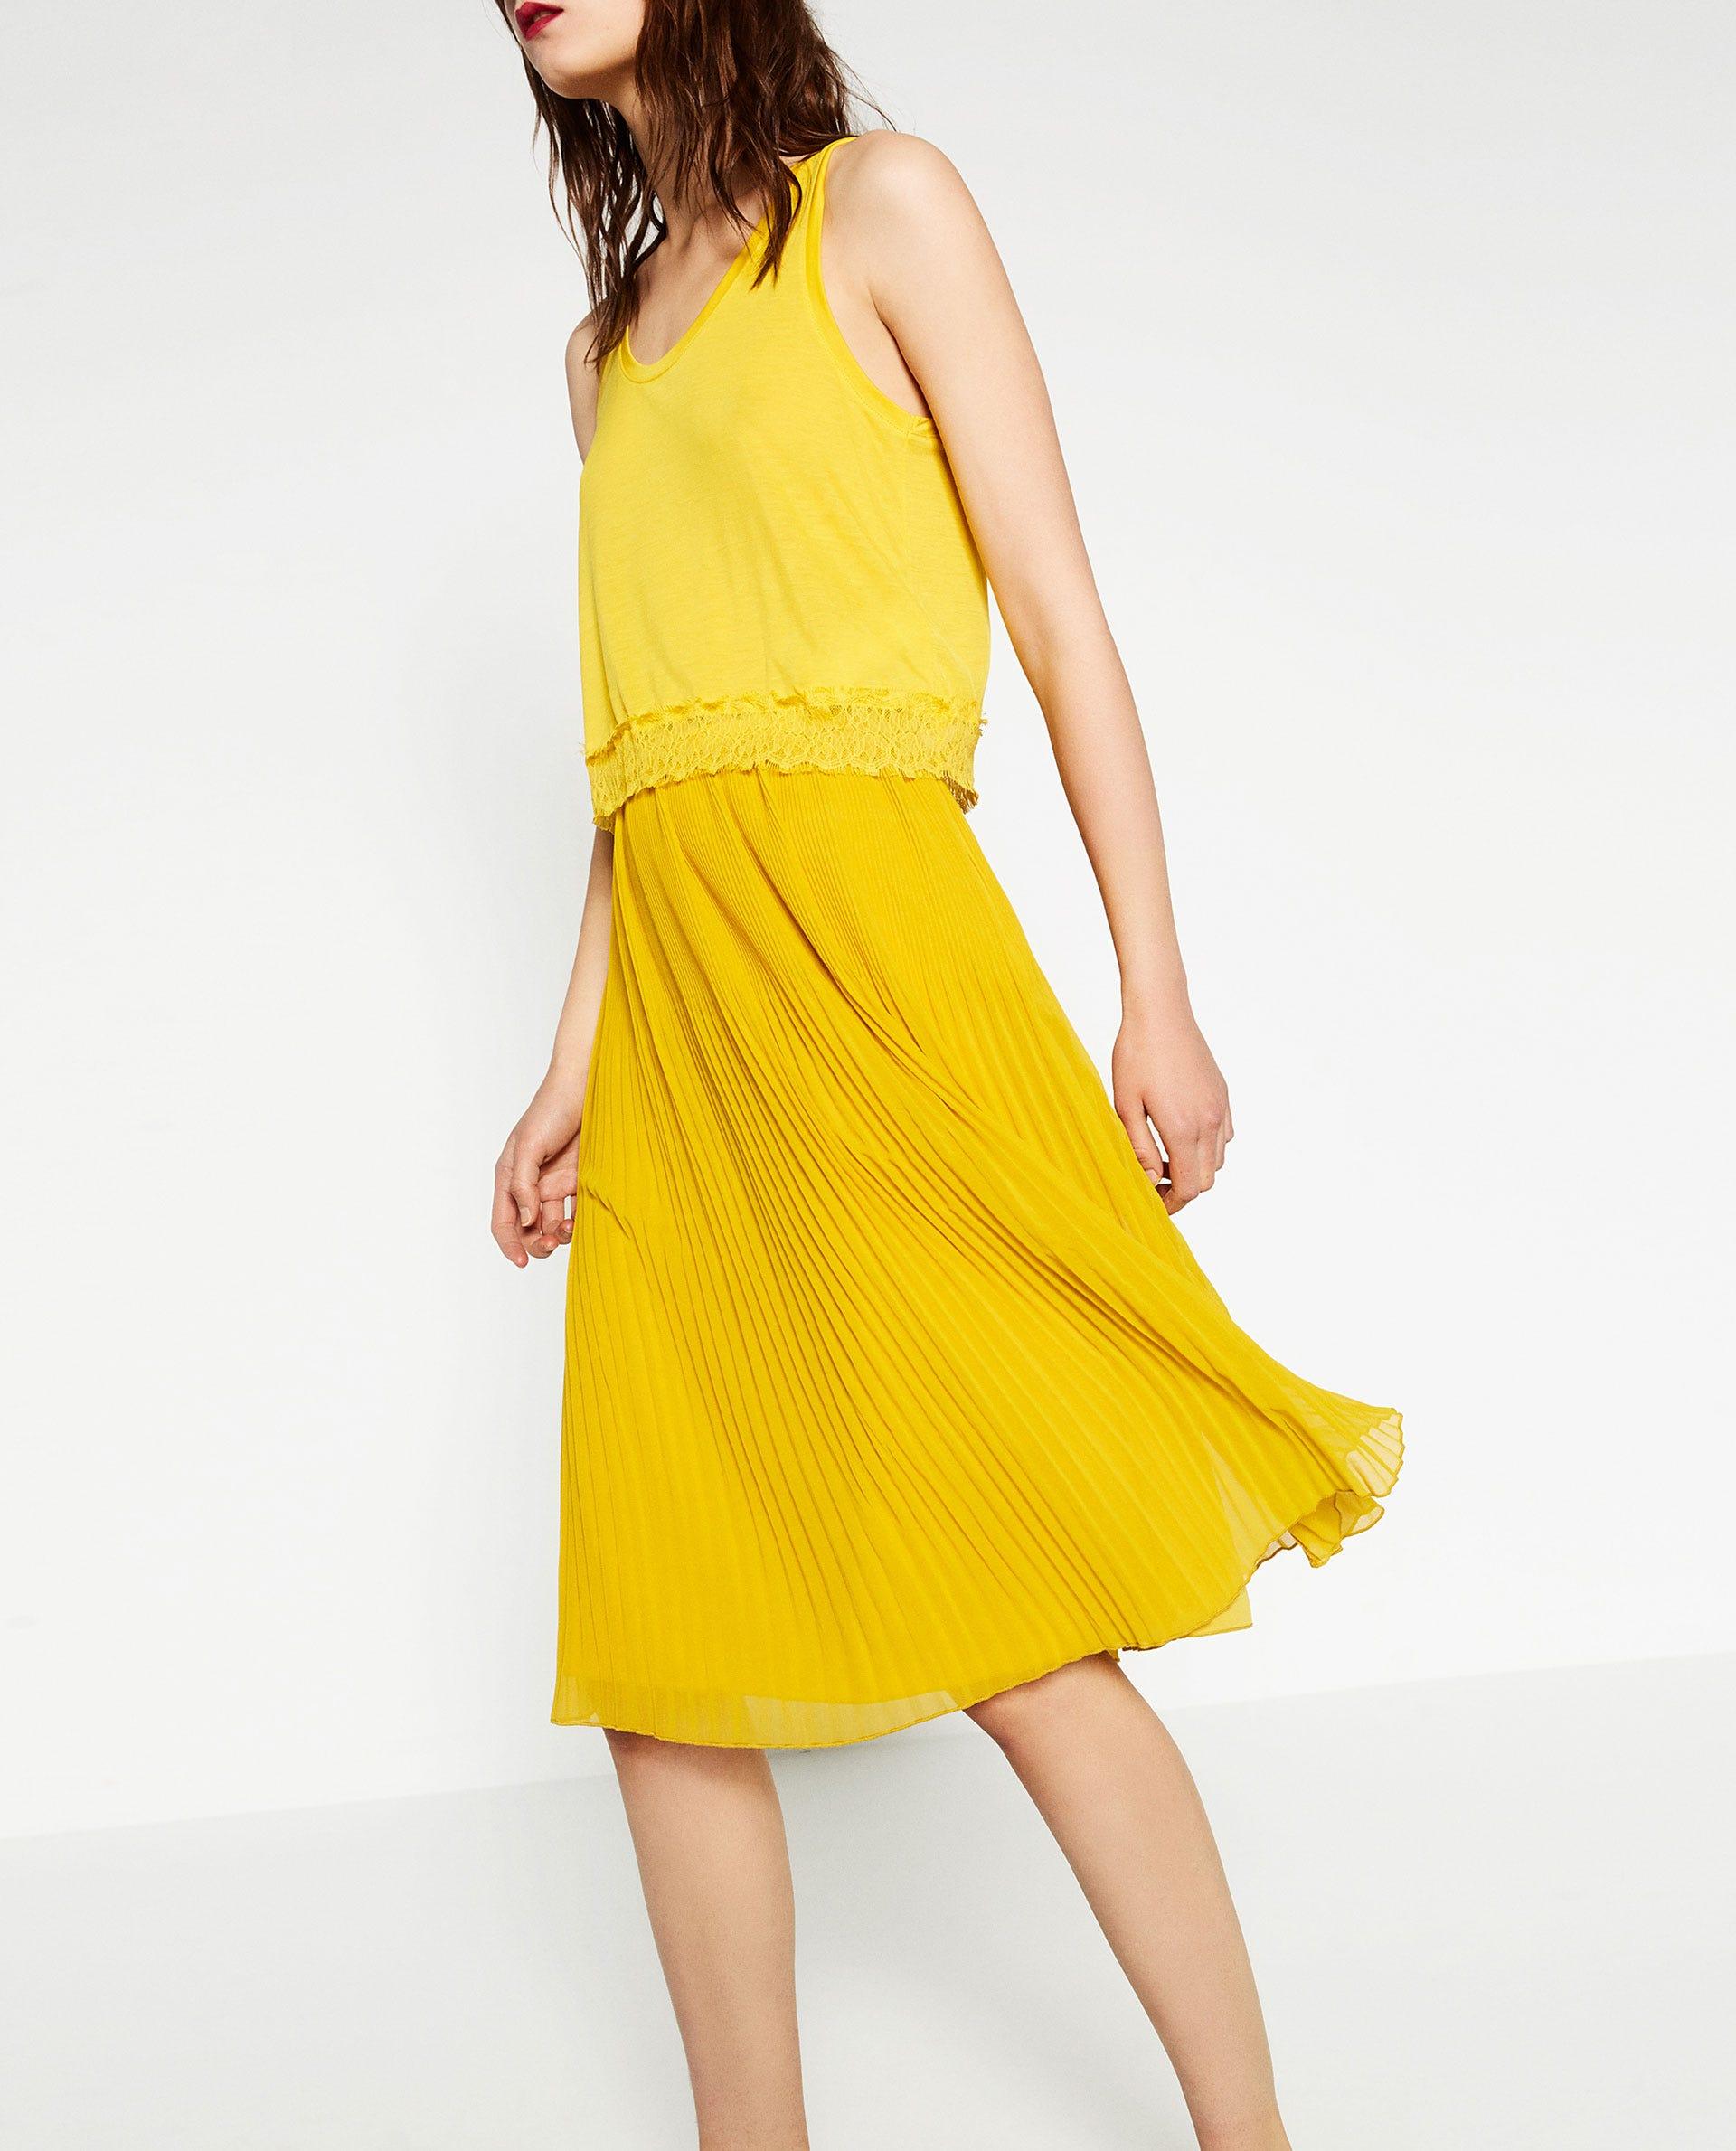 yellow dress zara  us presidential election